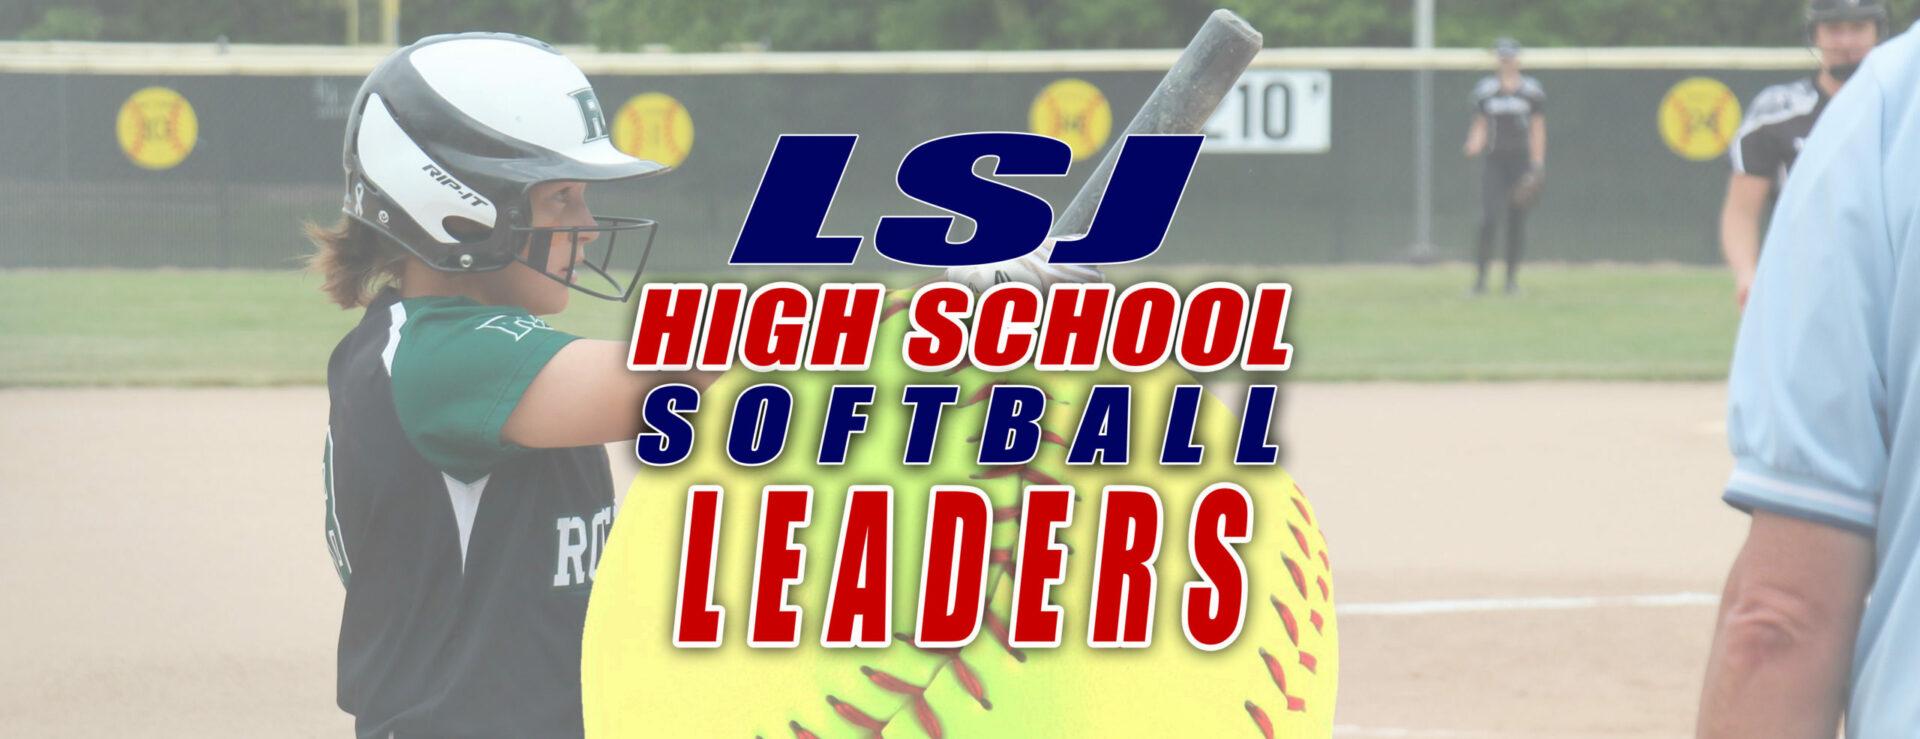 LOCALSPORTSJ0URNAL.COM LEADER BOARD: Muskegon area high school softball hitting leaders